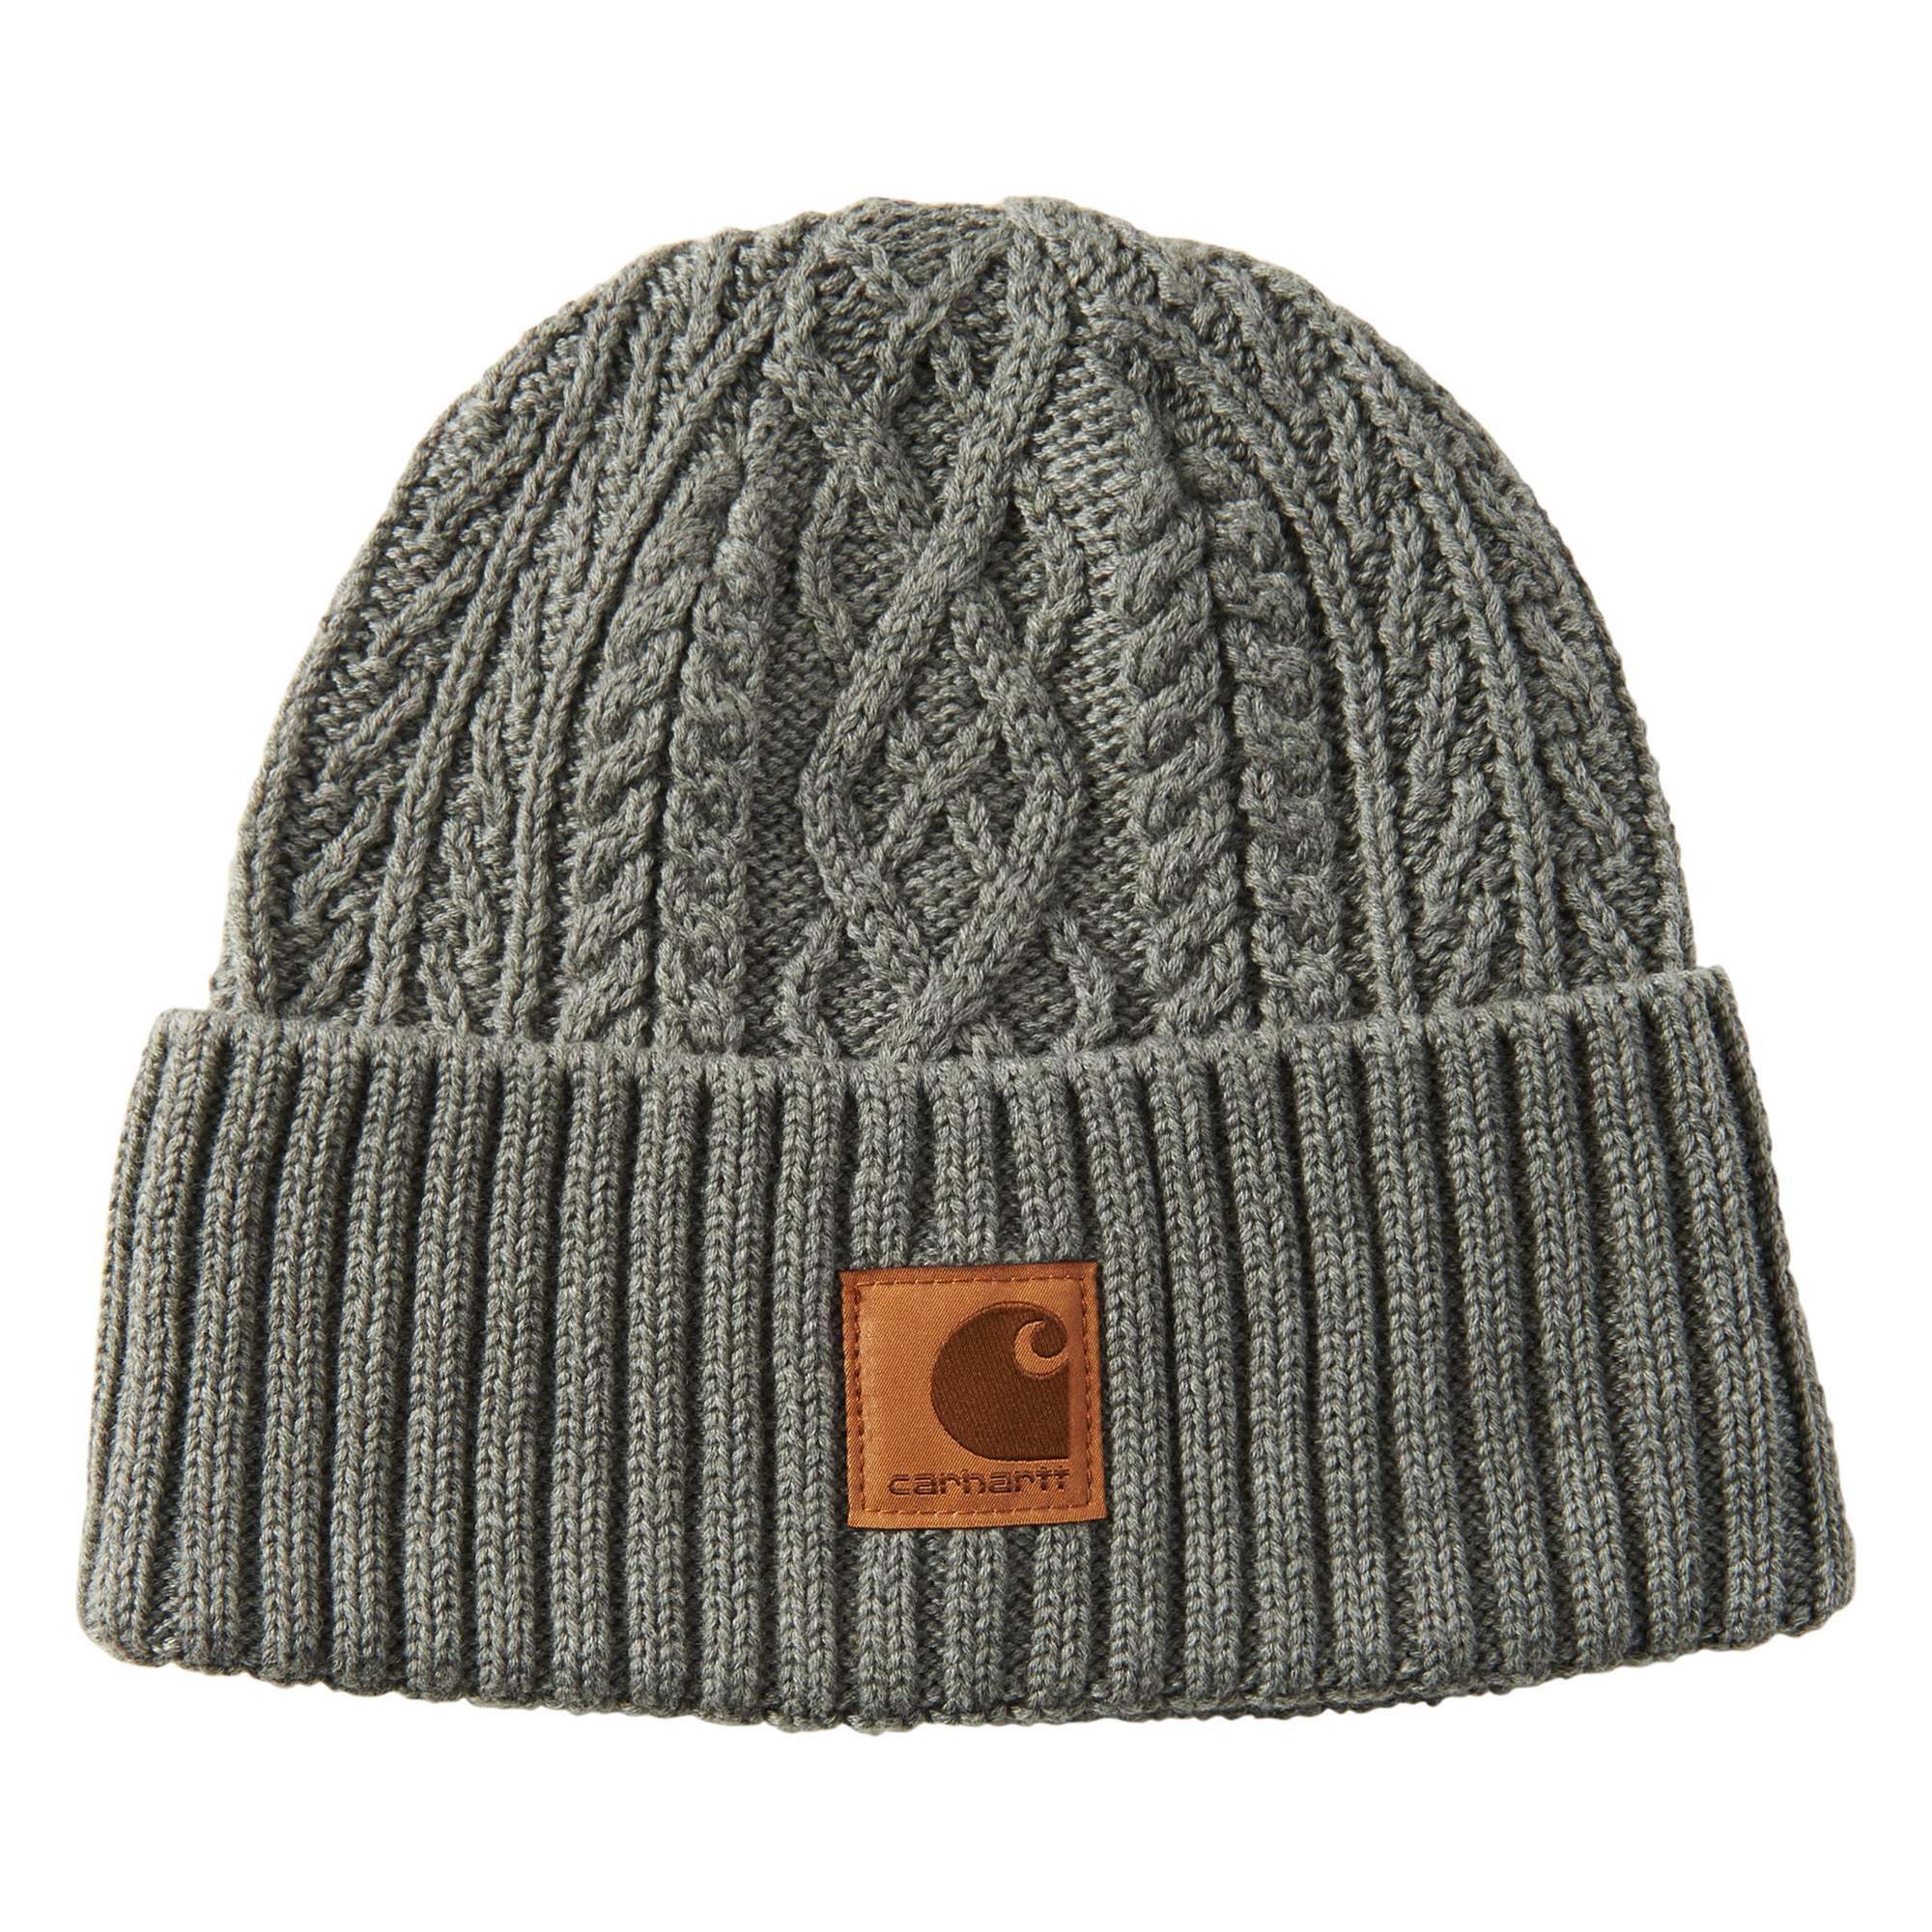 Carhartt Plated Fisherman Hat